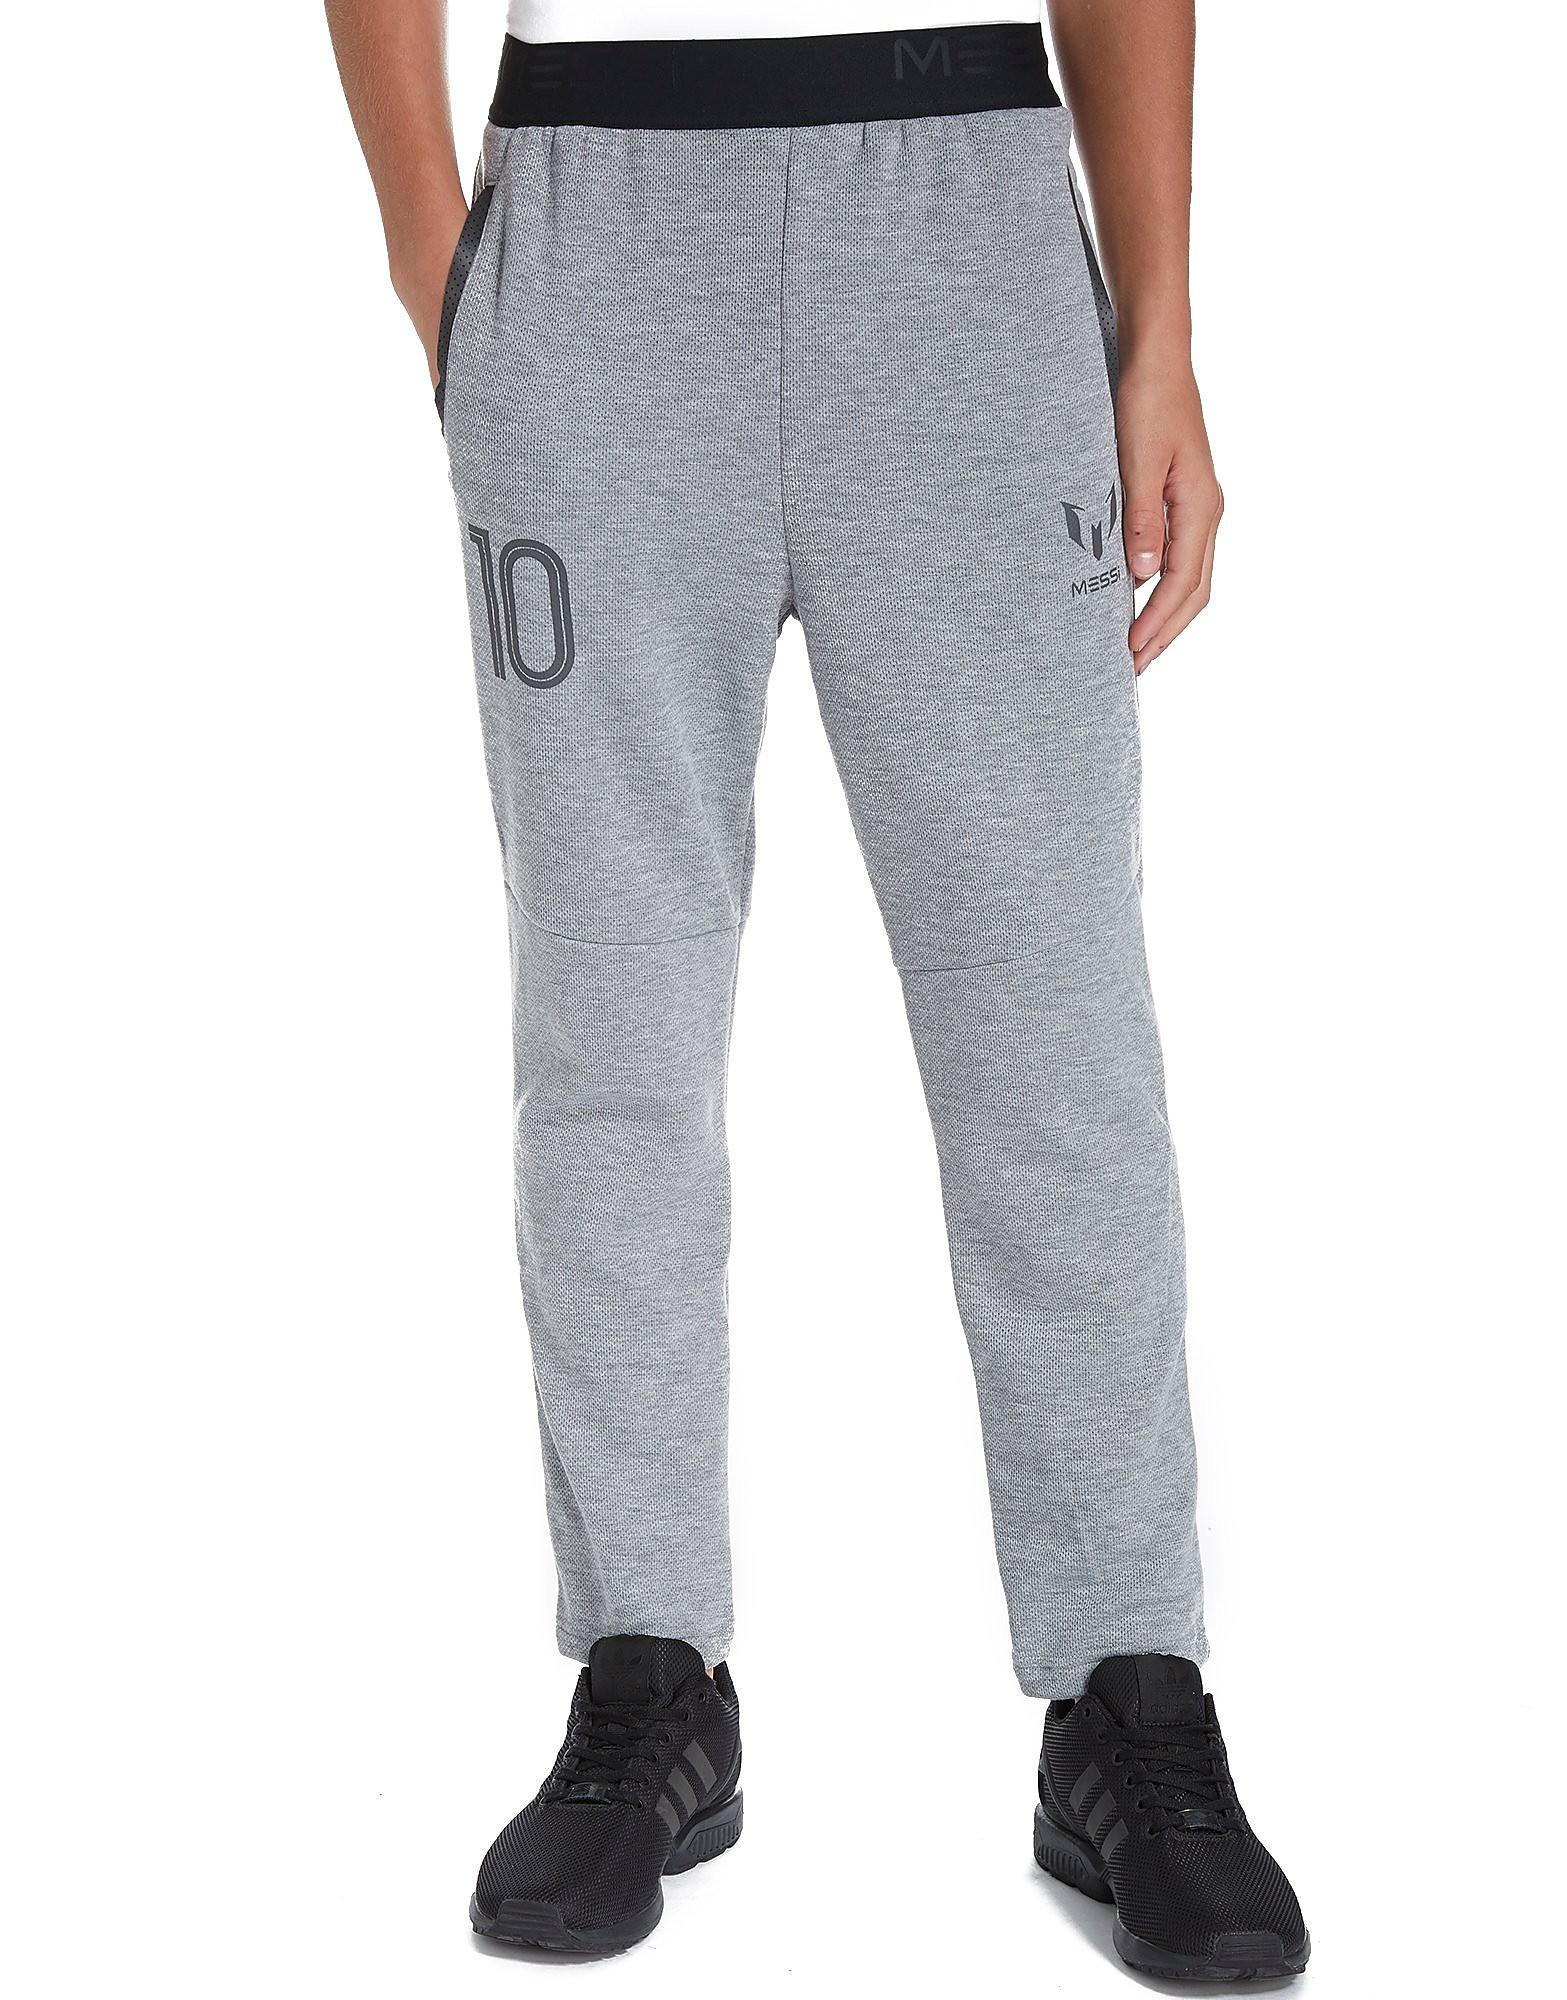 Image de adidas Messi Track Pants Enfants - Grey, Grey